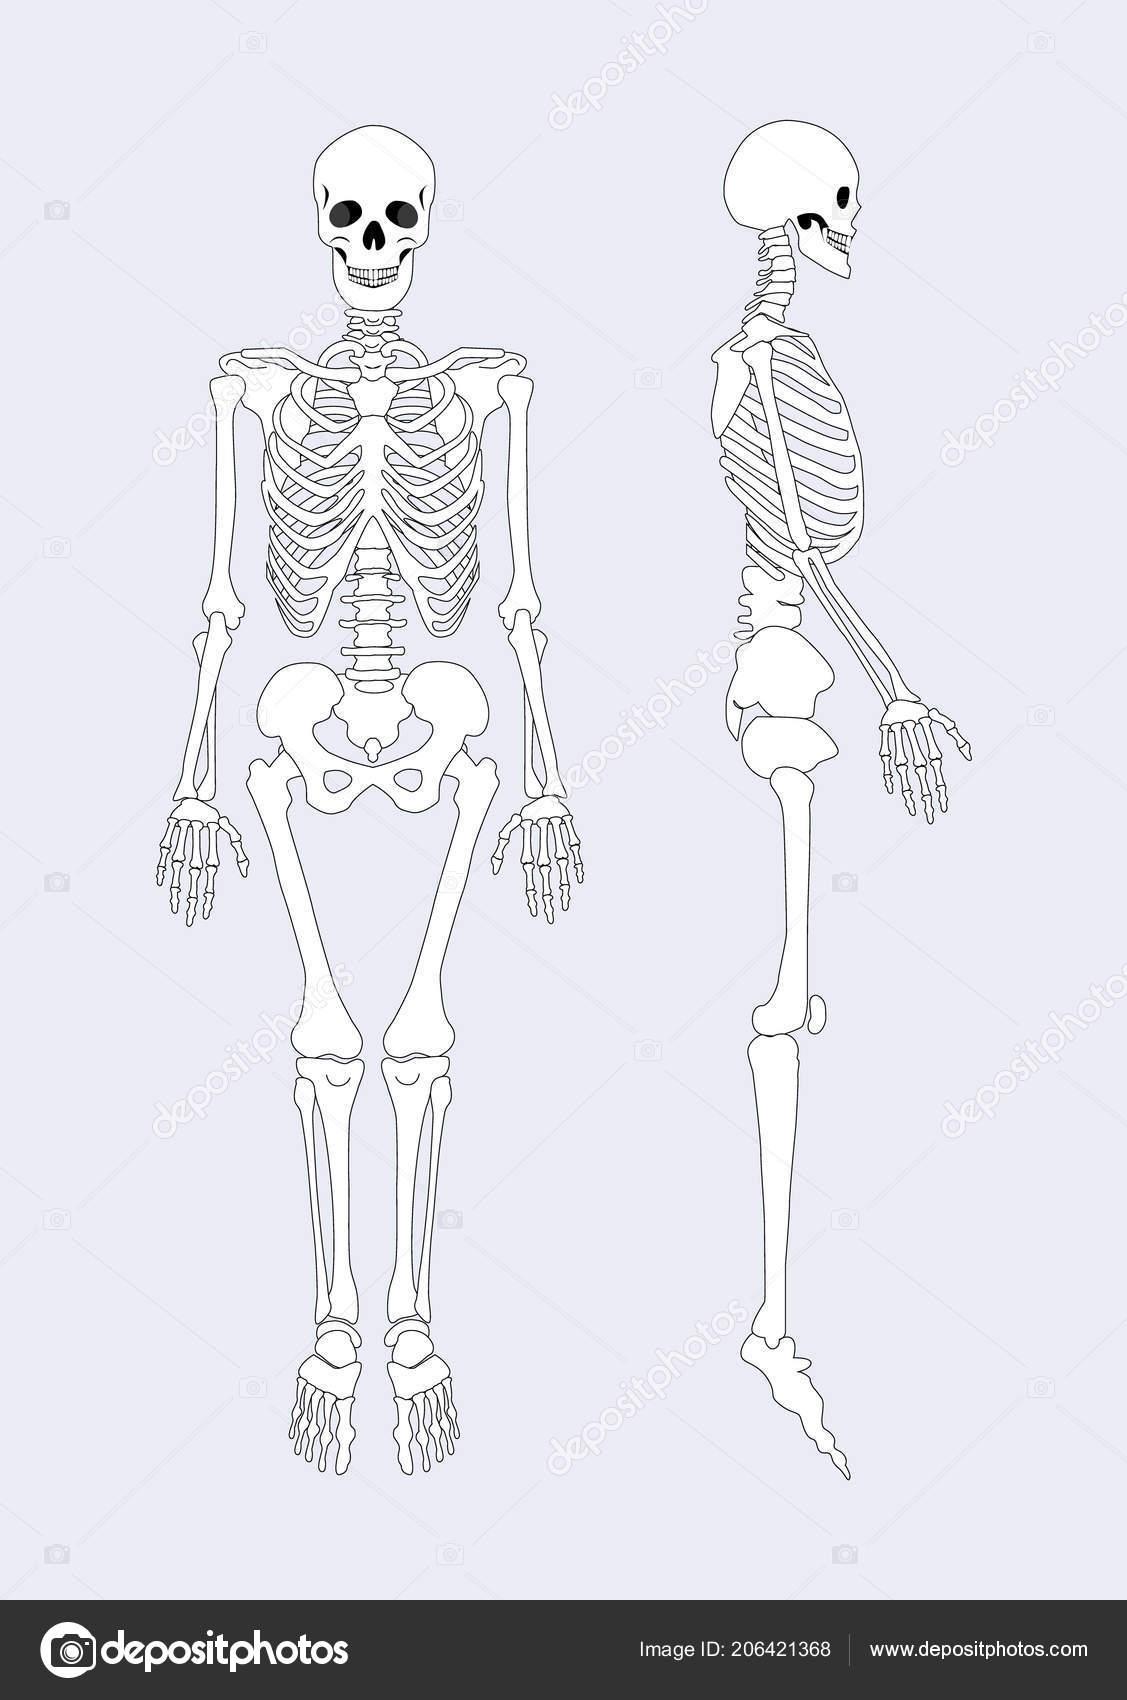 Skeletal System Of Human Body Vector Illustration Stock Vector